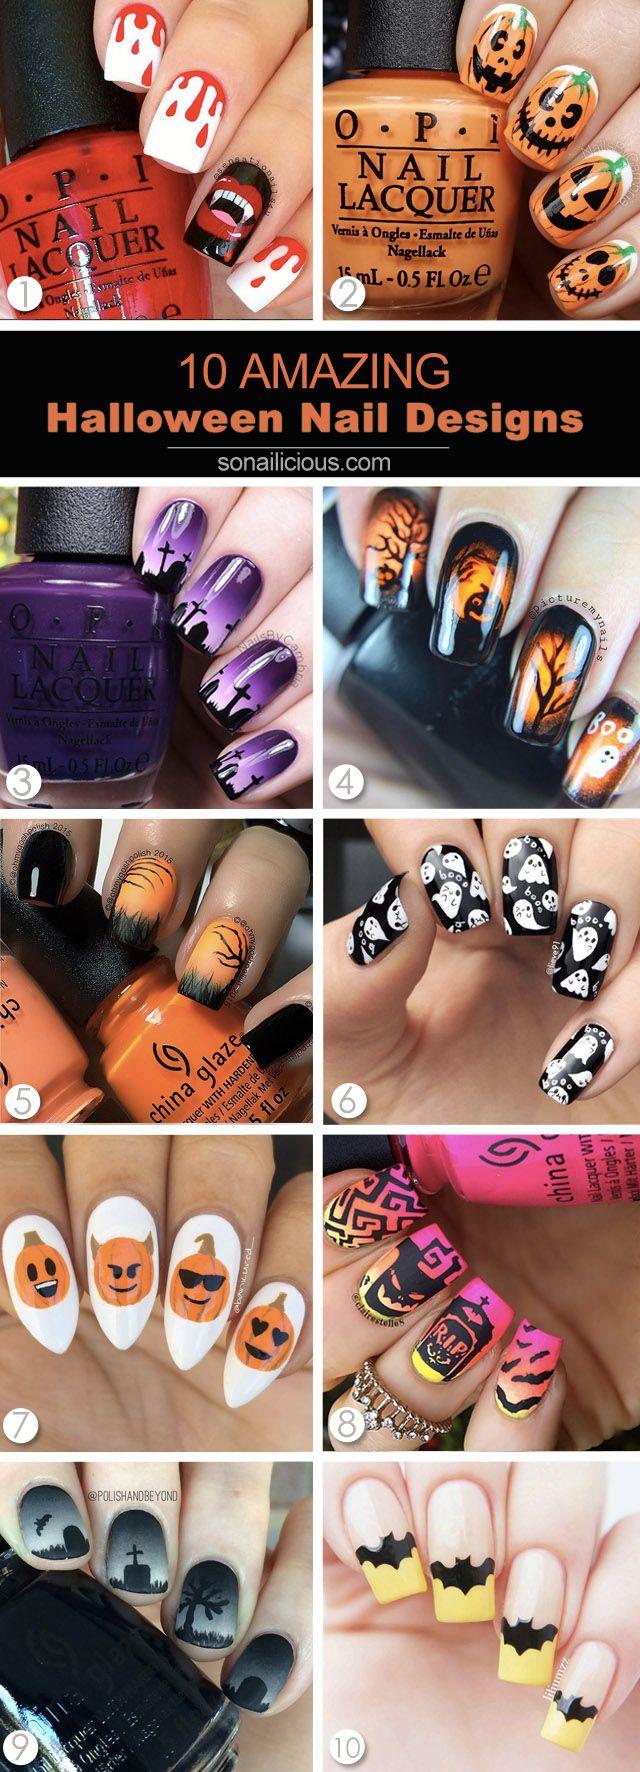 The best Halloween nail art of 2015: http://sonailicious.com/10-best-halloween-nails-on-instagram/